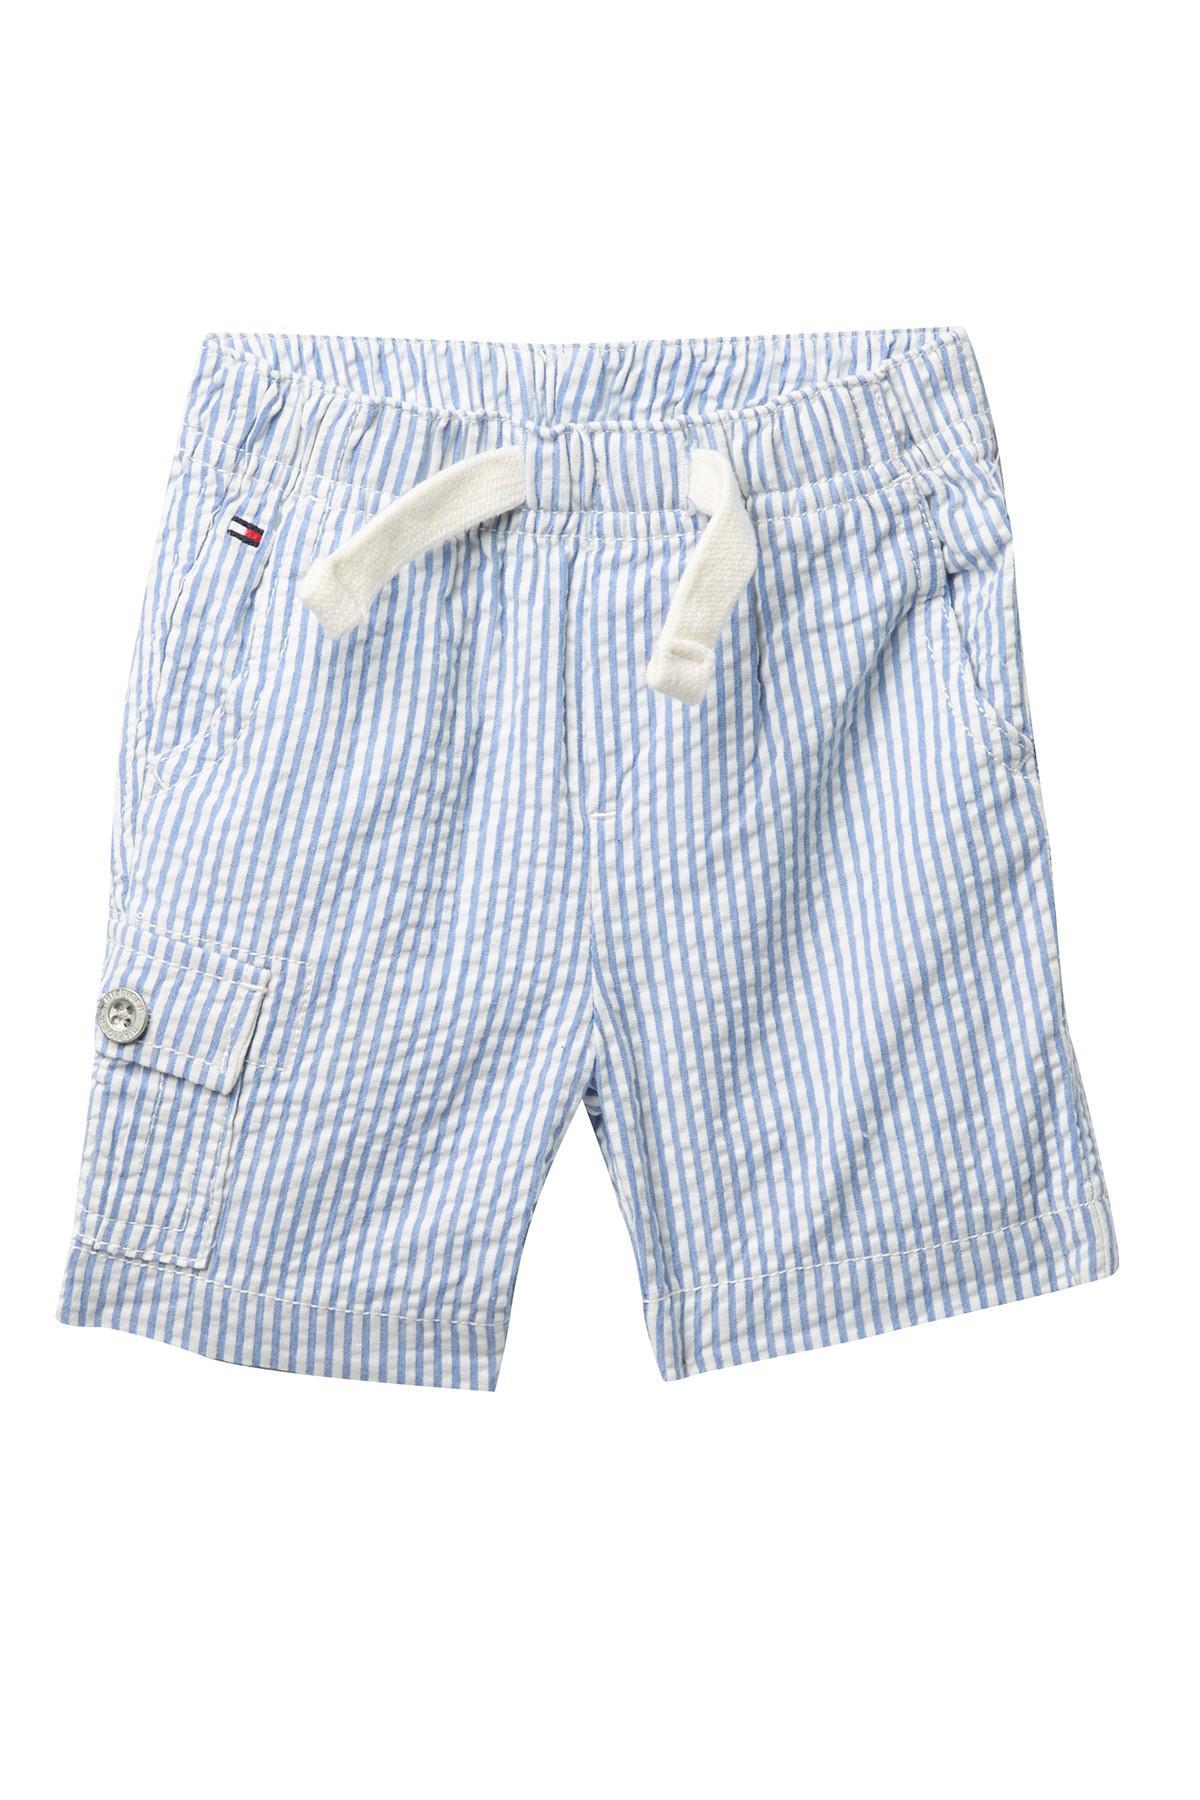 cdecfb3c0f Tommy Hilfiger Tom Seersucker Shorts (baby Boys 3-9m) in Blue for ...